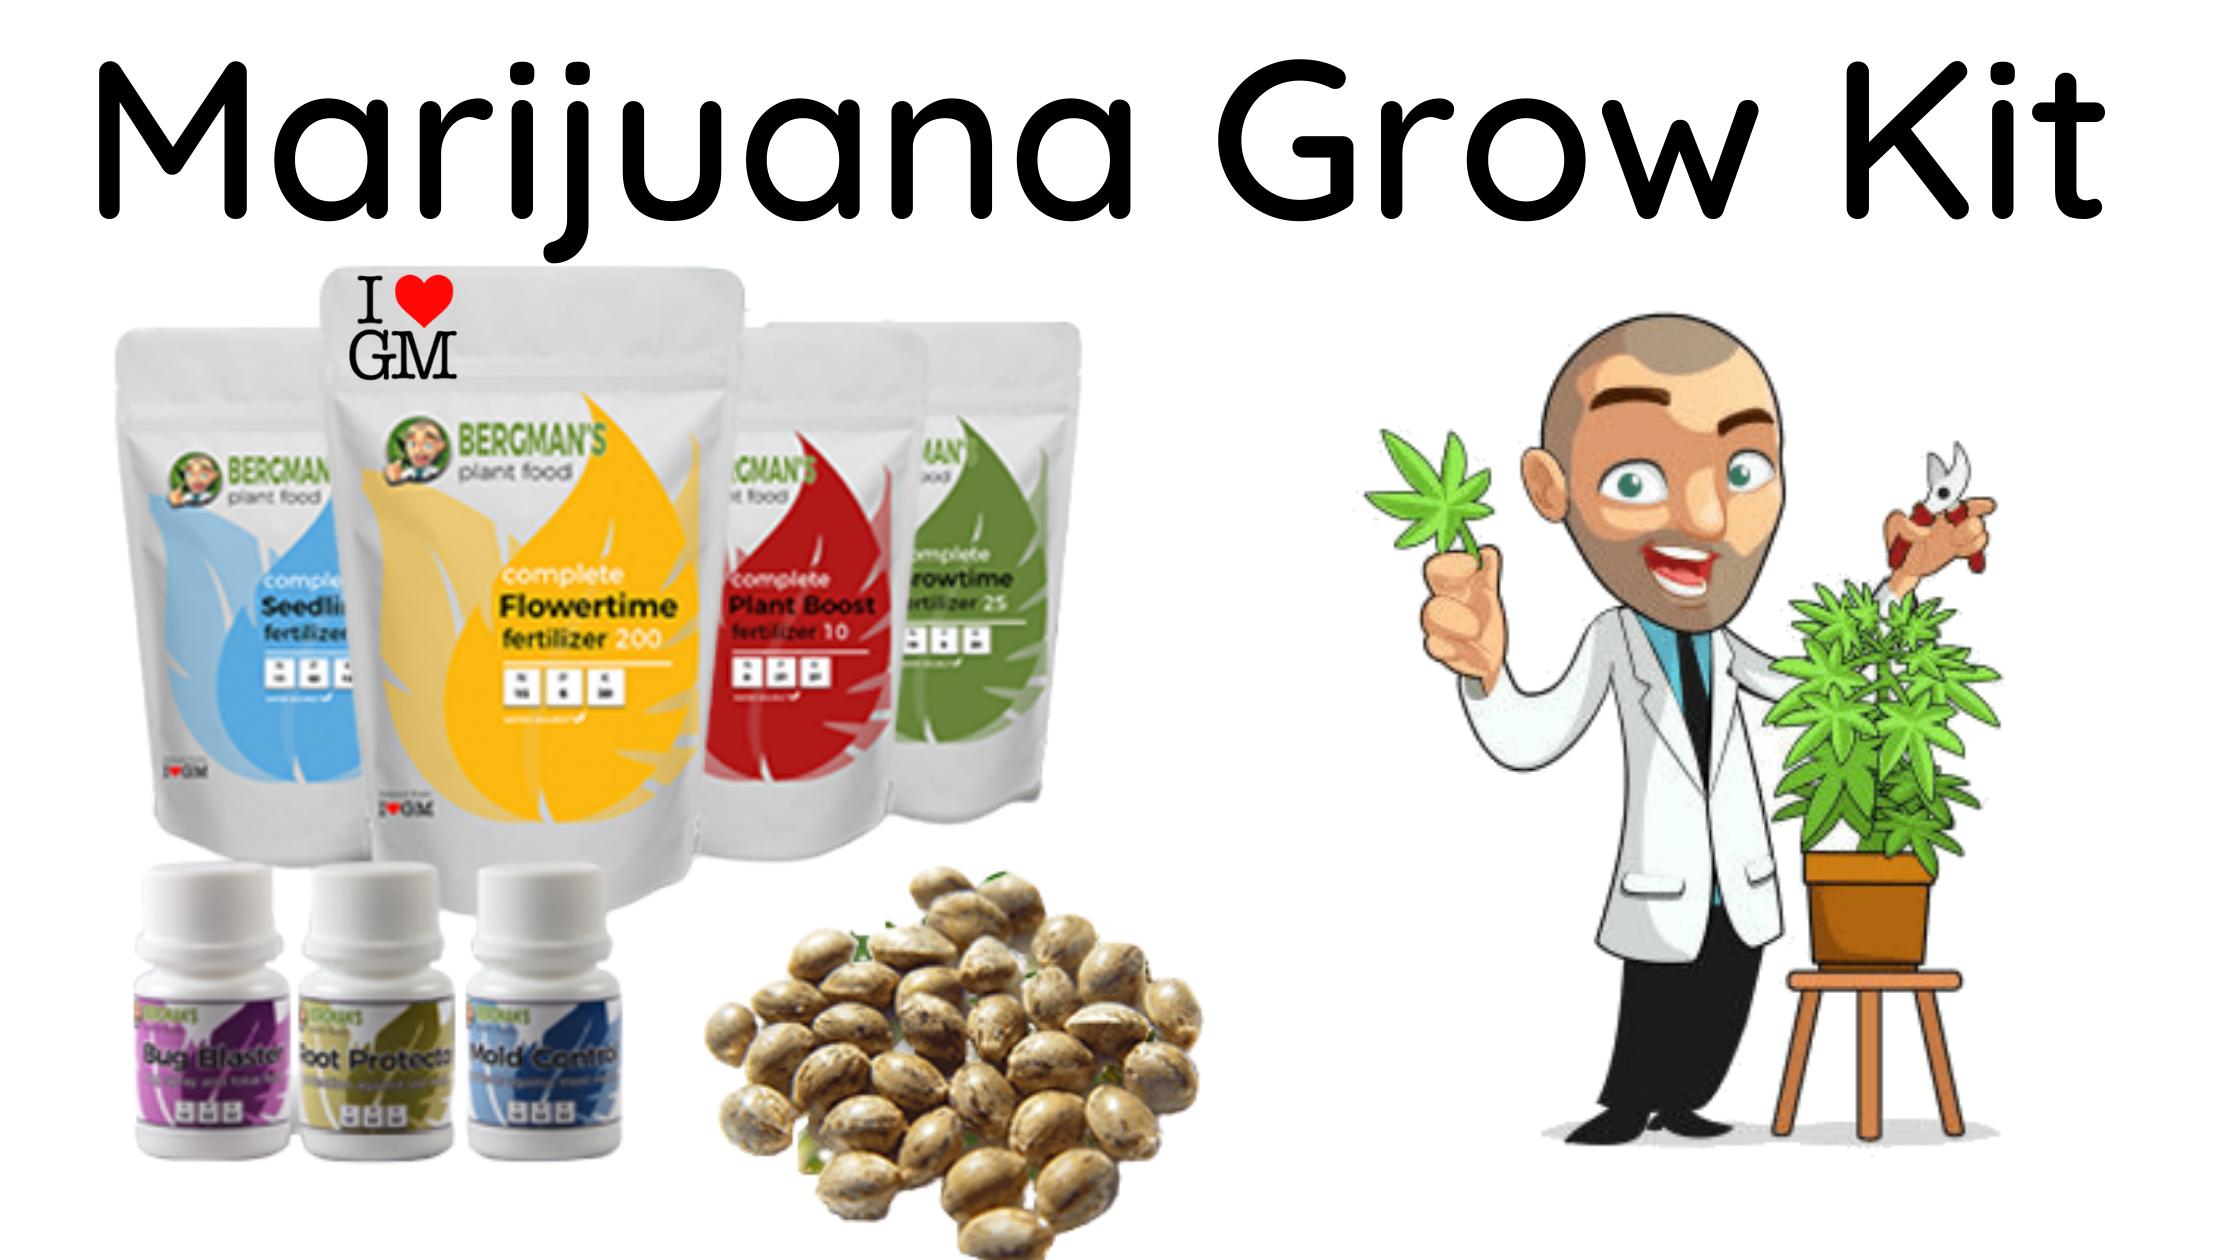 Marijuana Grow Kit for Beginners